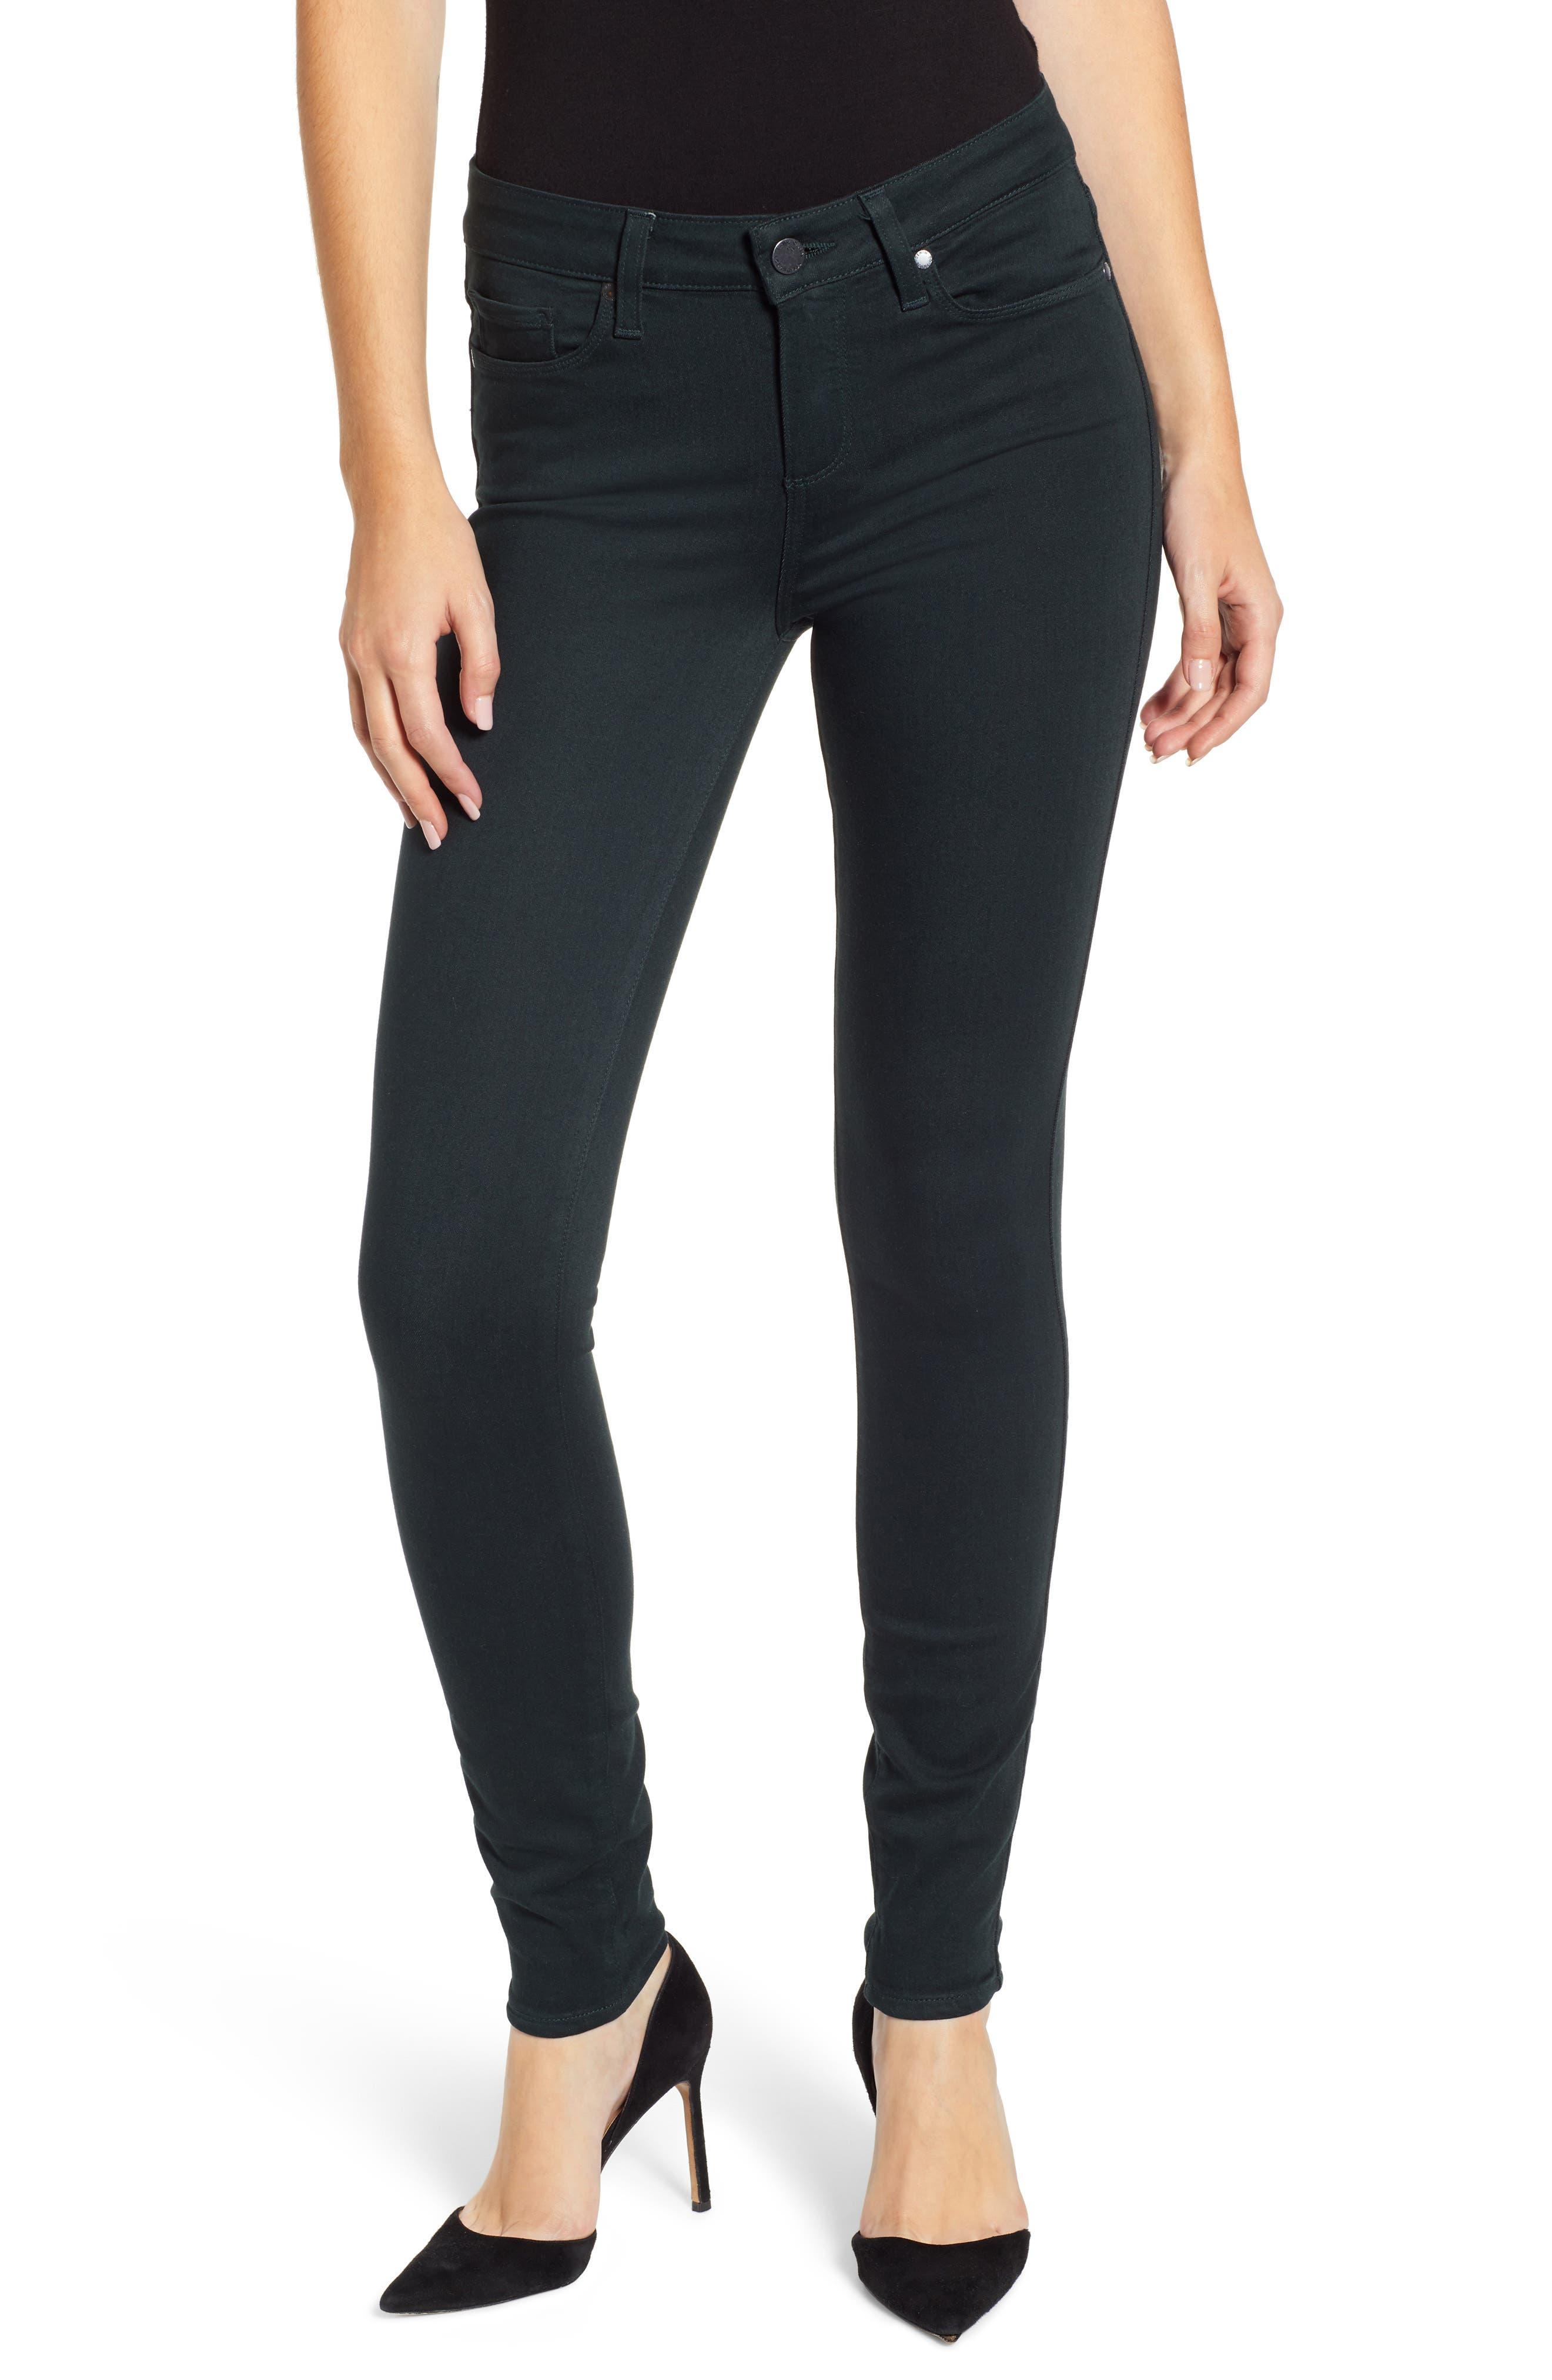 Transcend - Verdugo Ultra Skinny Jeans,                             Main thumbnail 1, color,                             MIDNIGHT GREEN